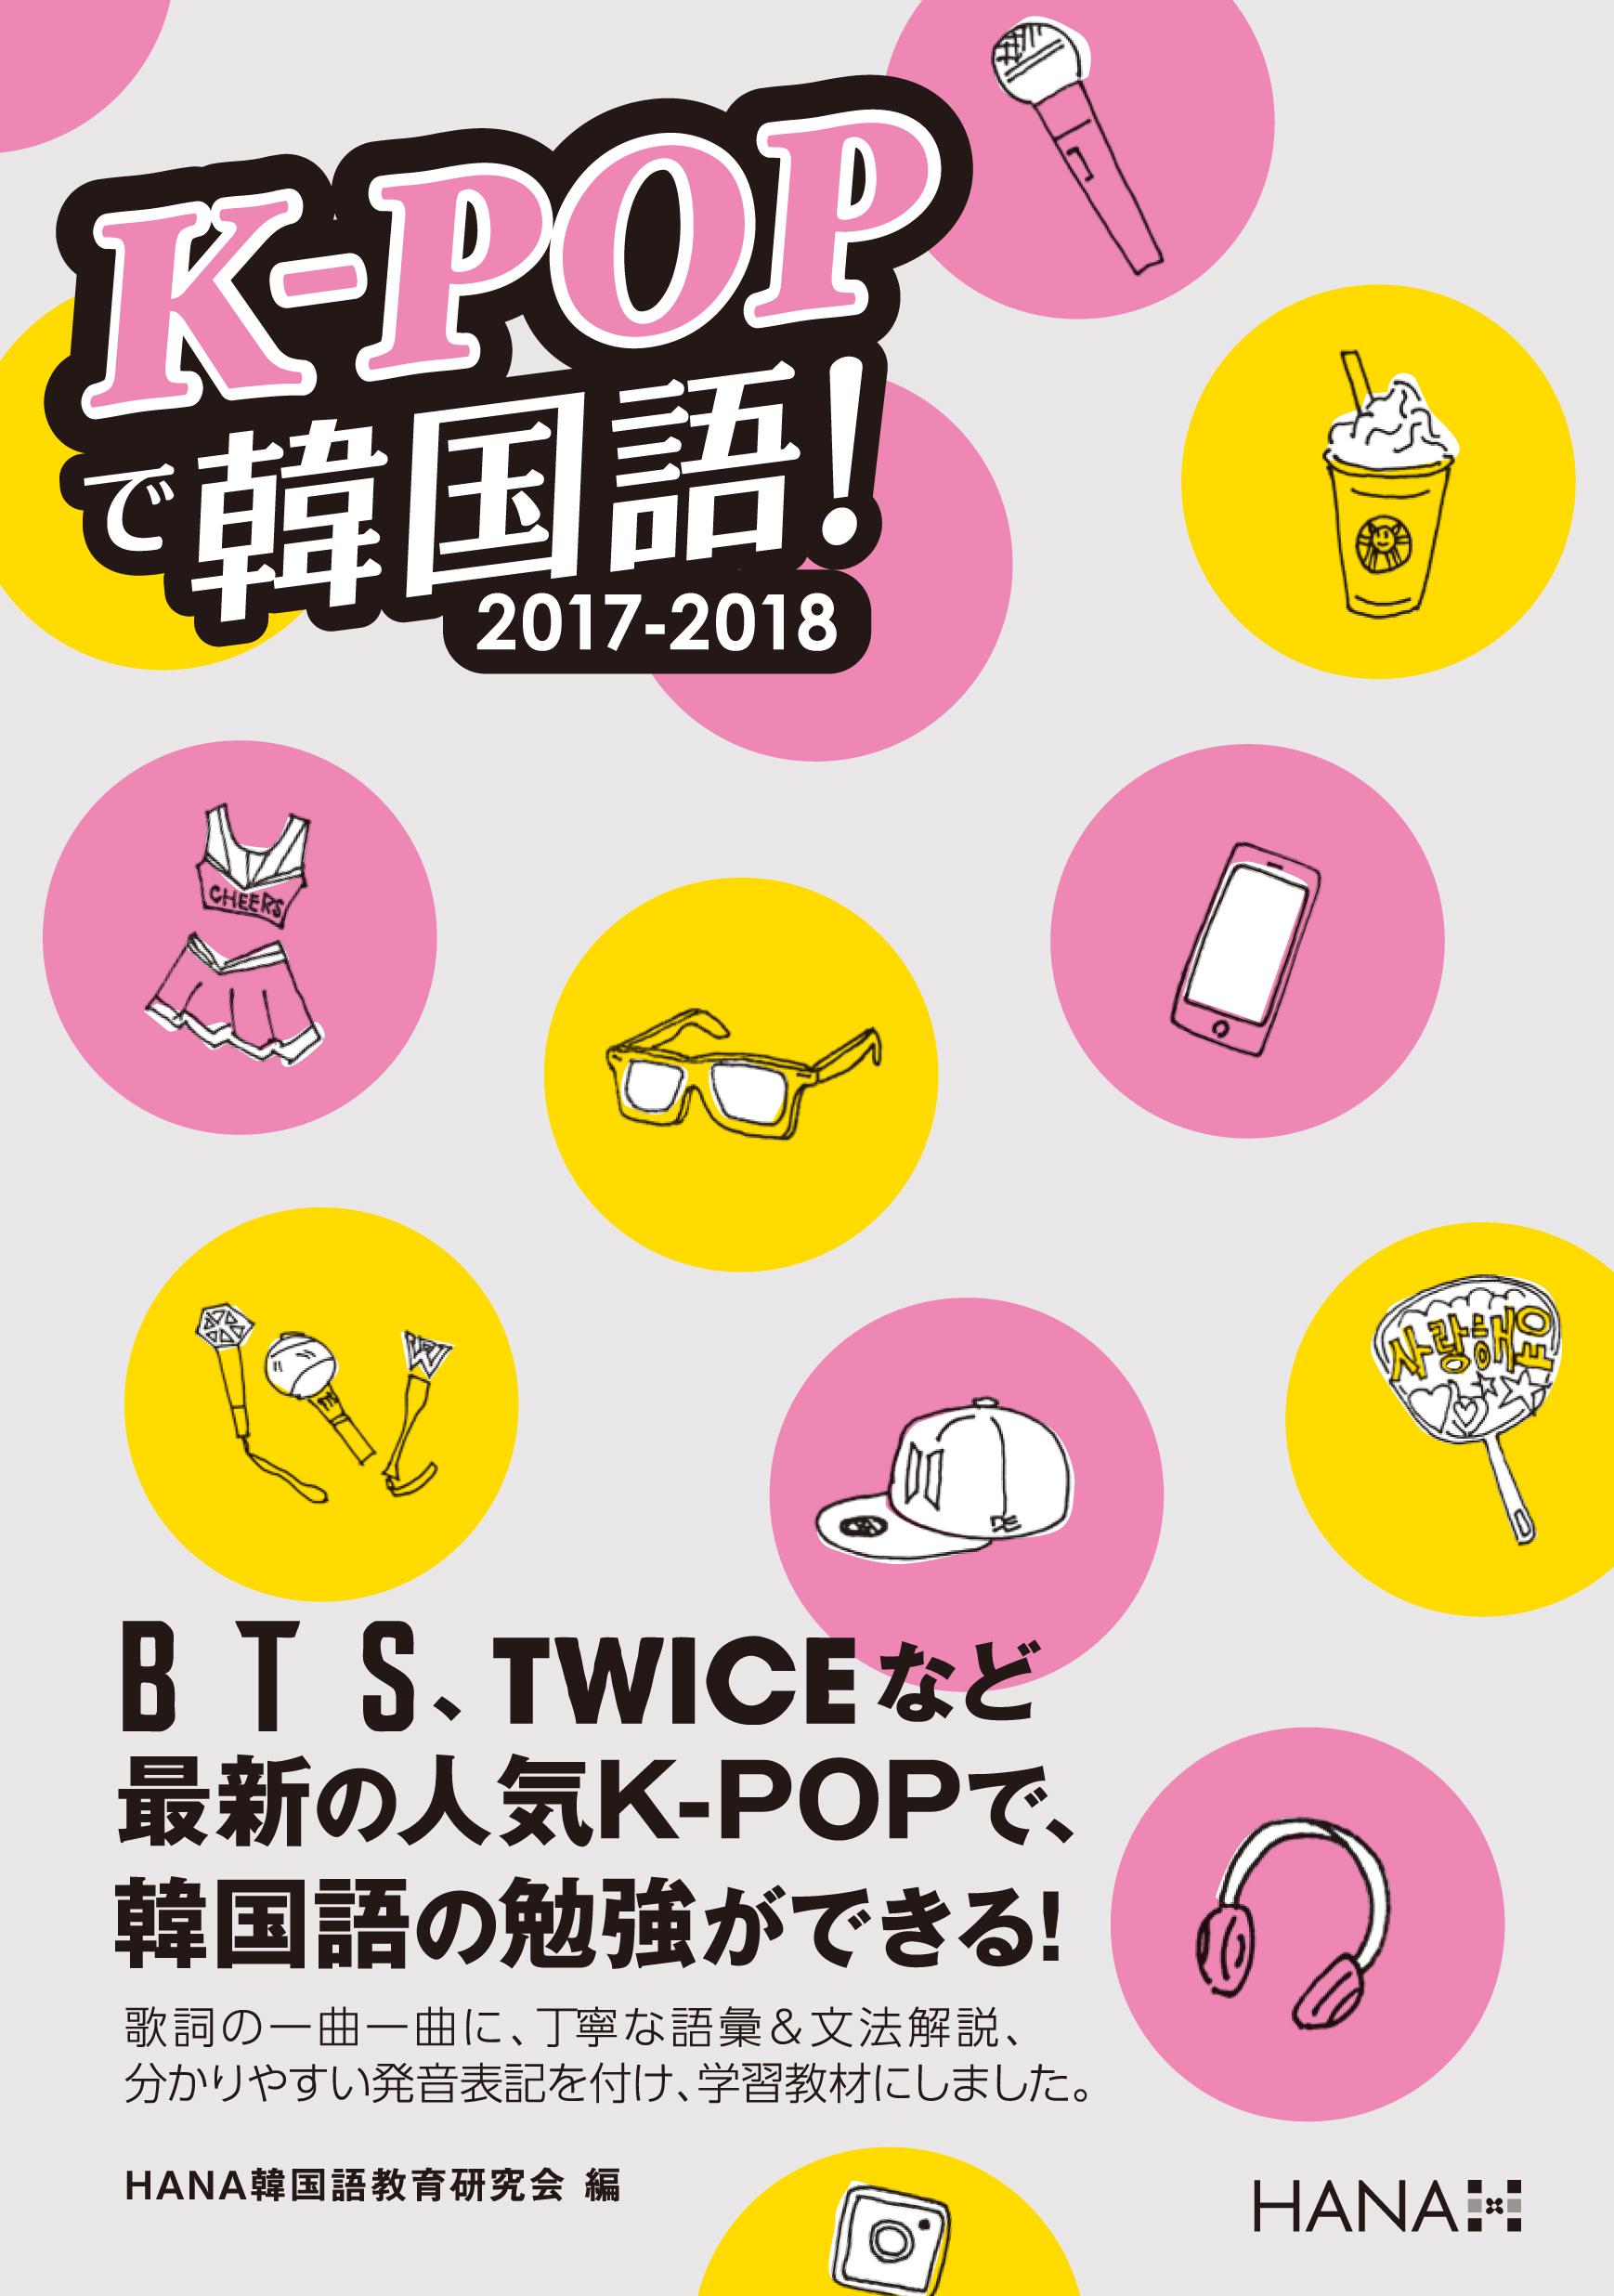 『K-POPで韓国語!2017-2018』のイメージ